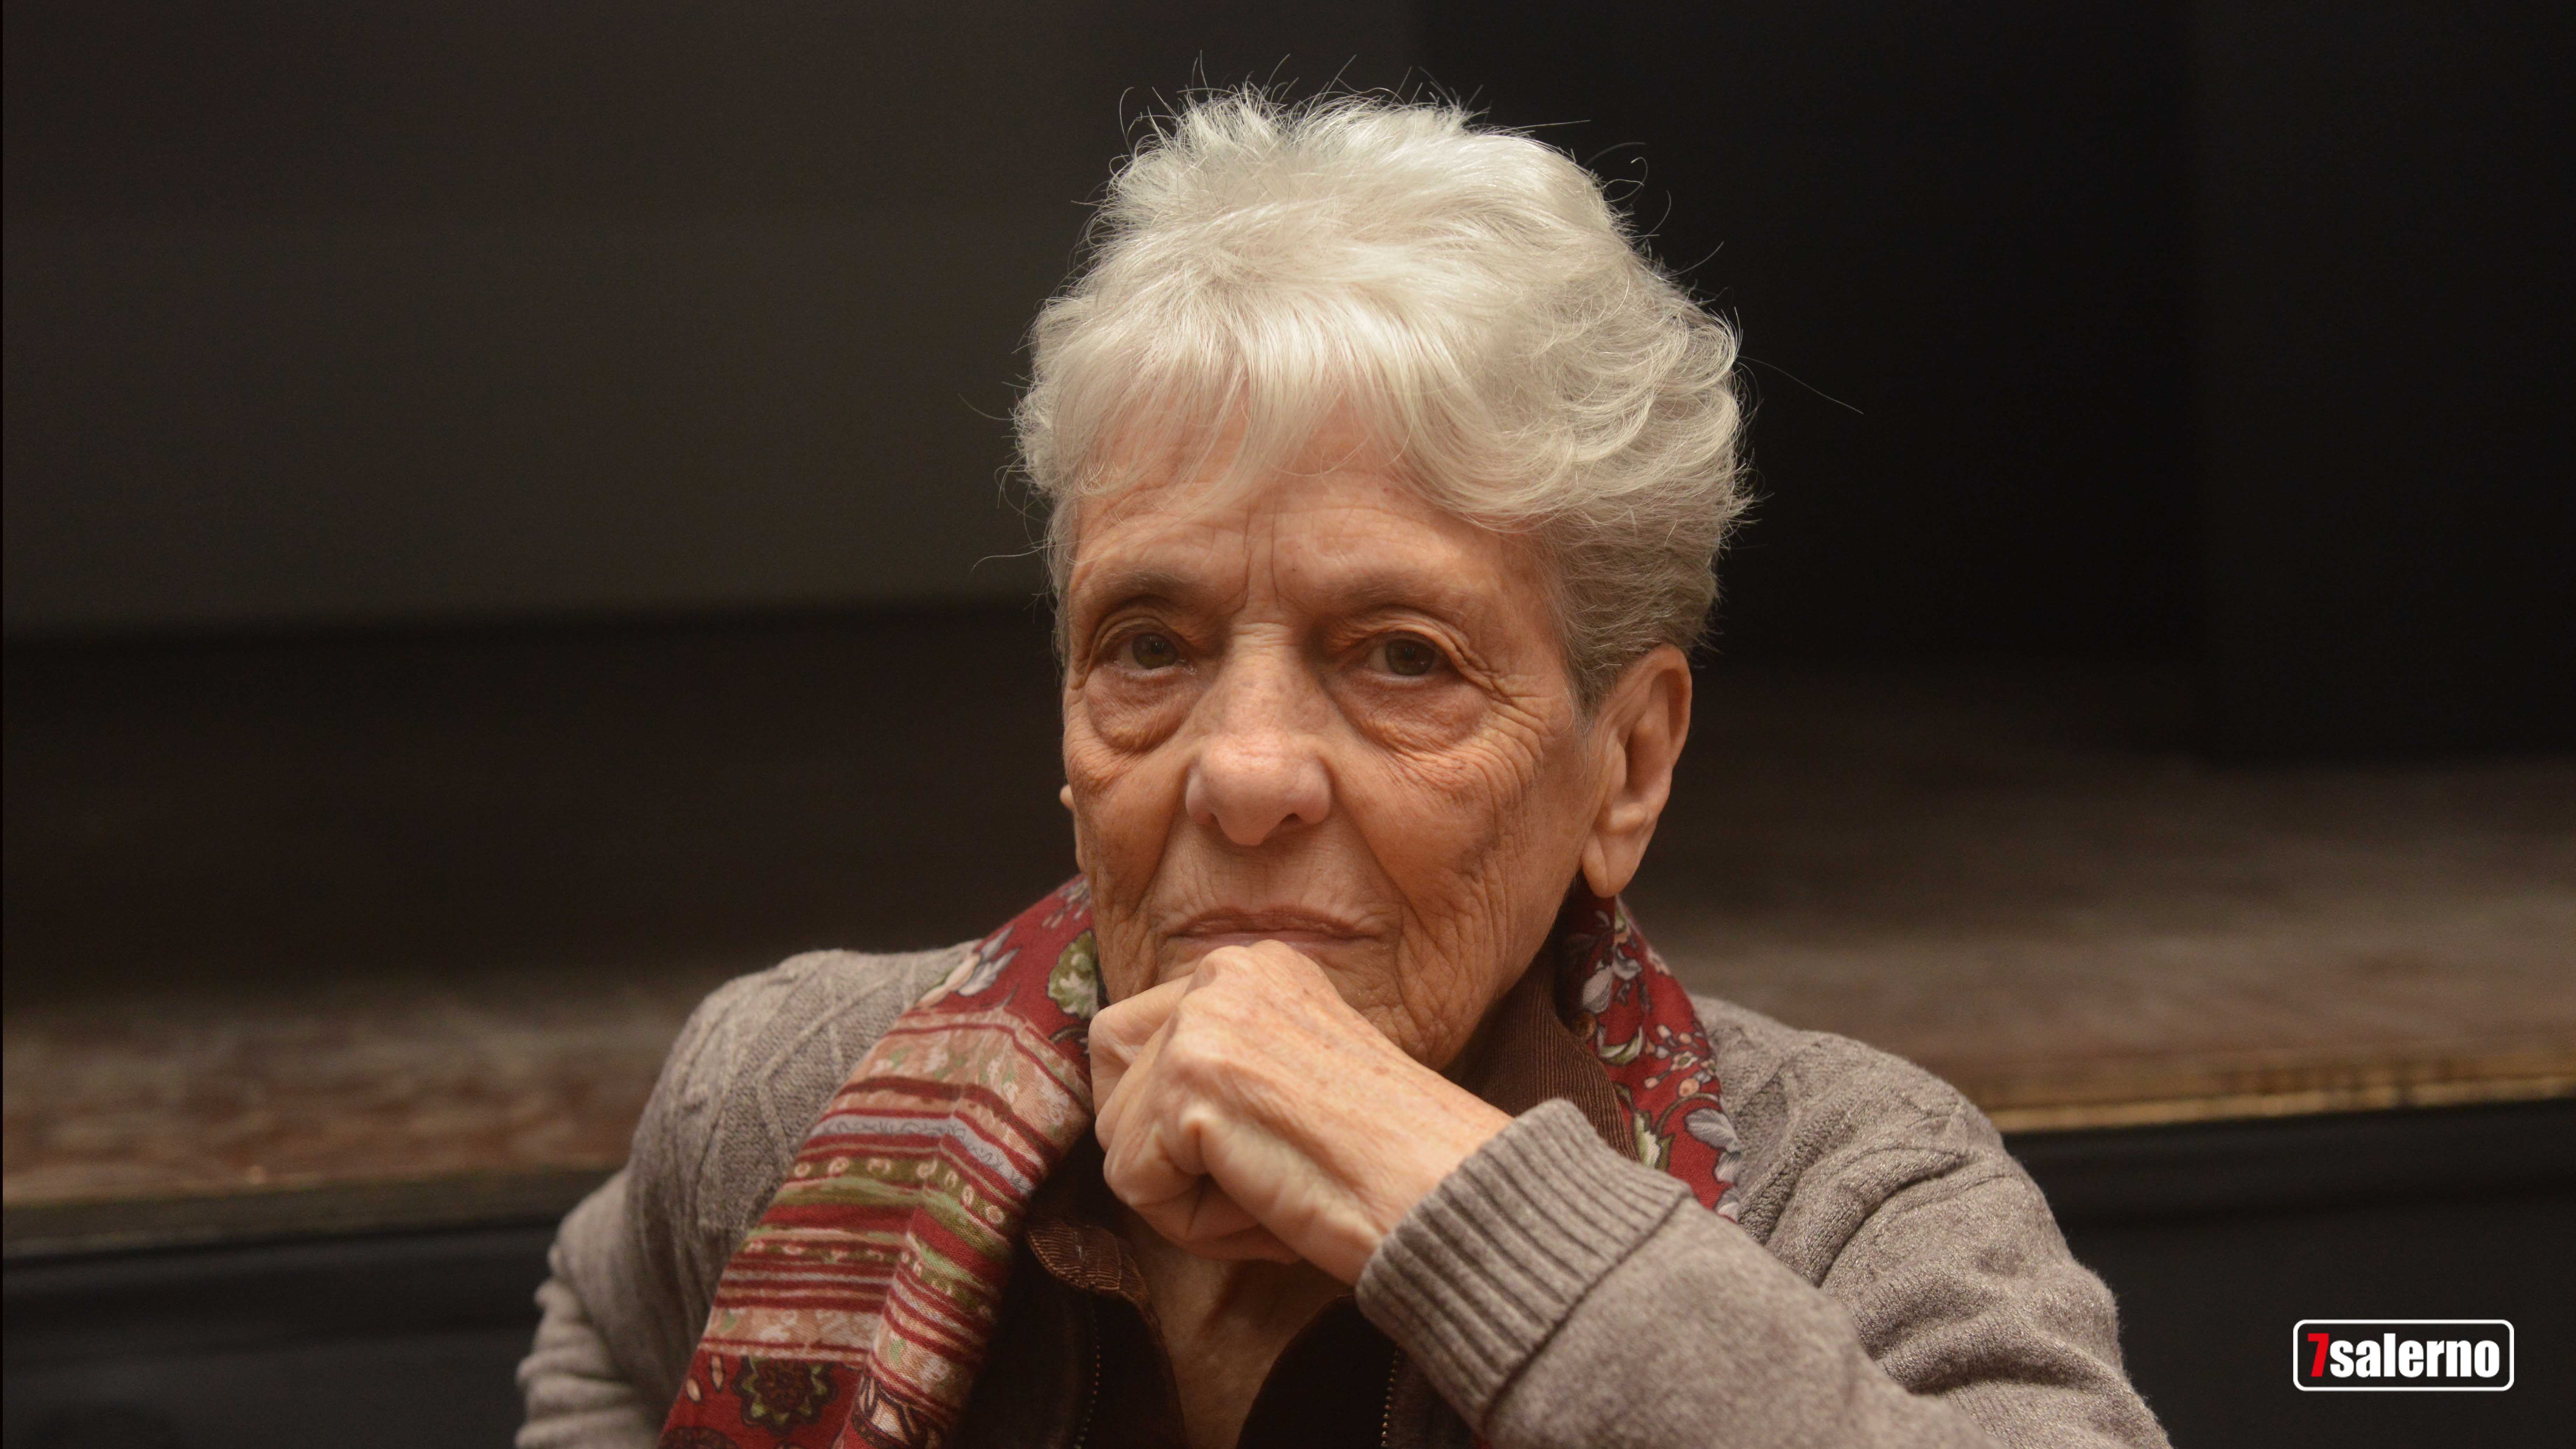 La pittrice Ana Maria Erra Guevara-Copyright2019.Sevensalerno